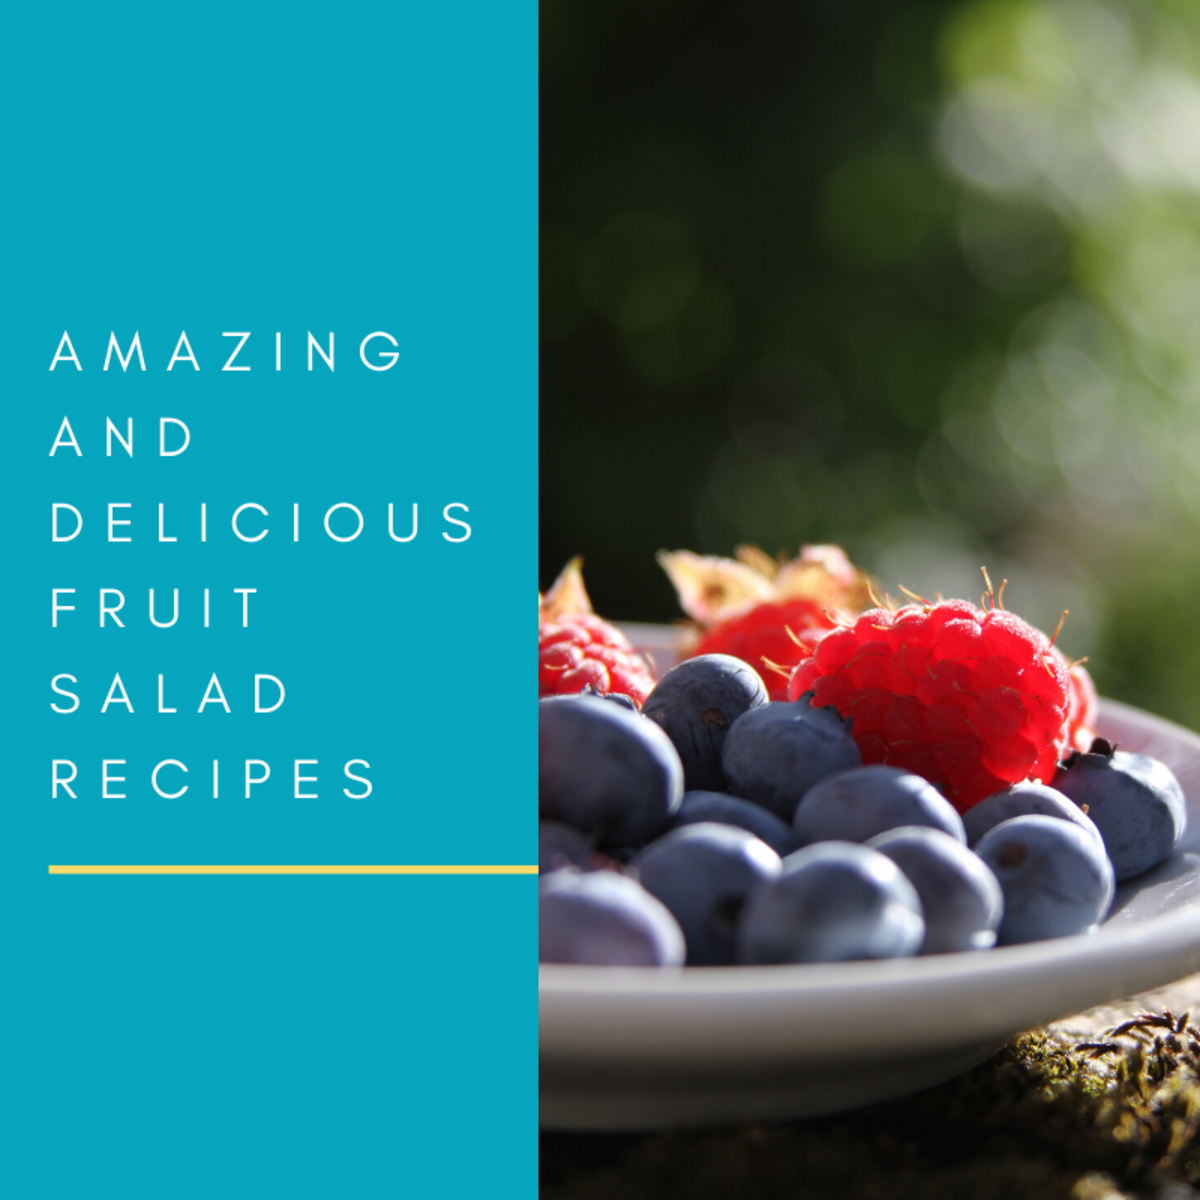 4 Delicious Fruit Salad Recipes